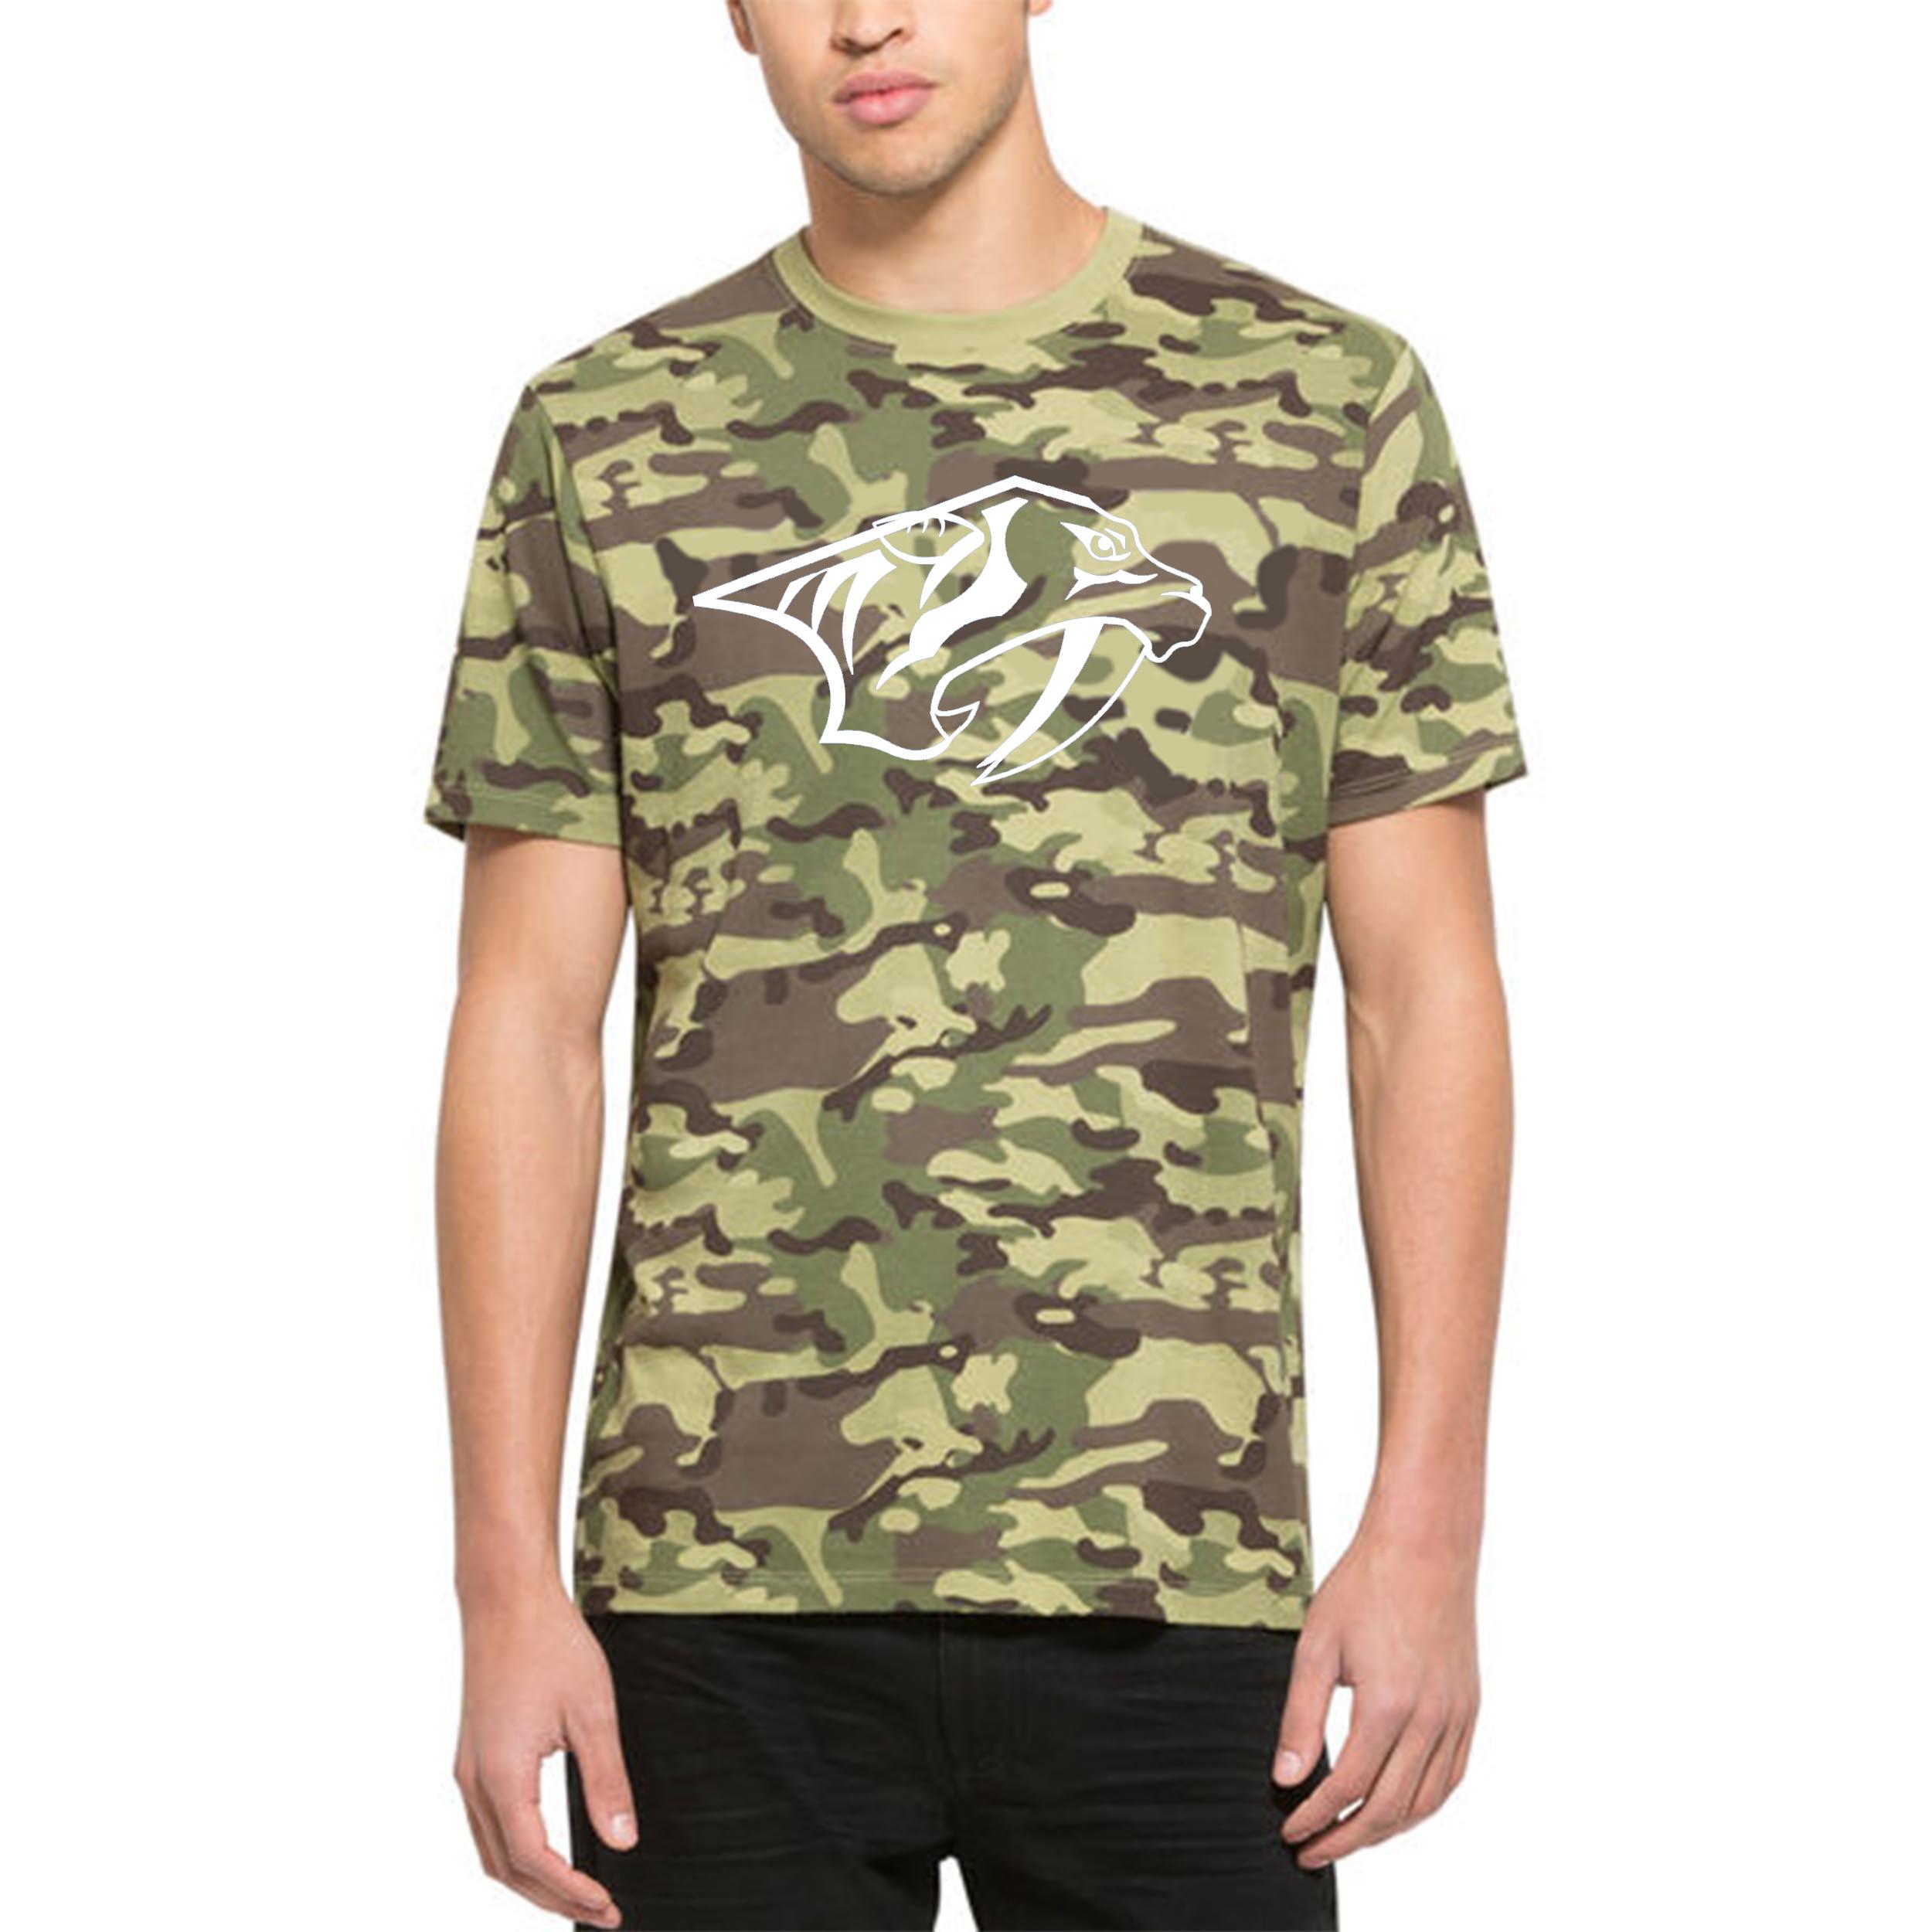 Nashville Predators '47 Alpha T-Shirt Camo